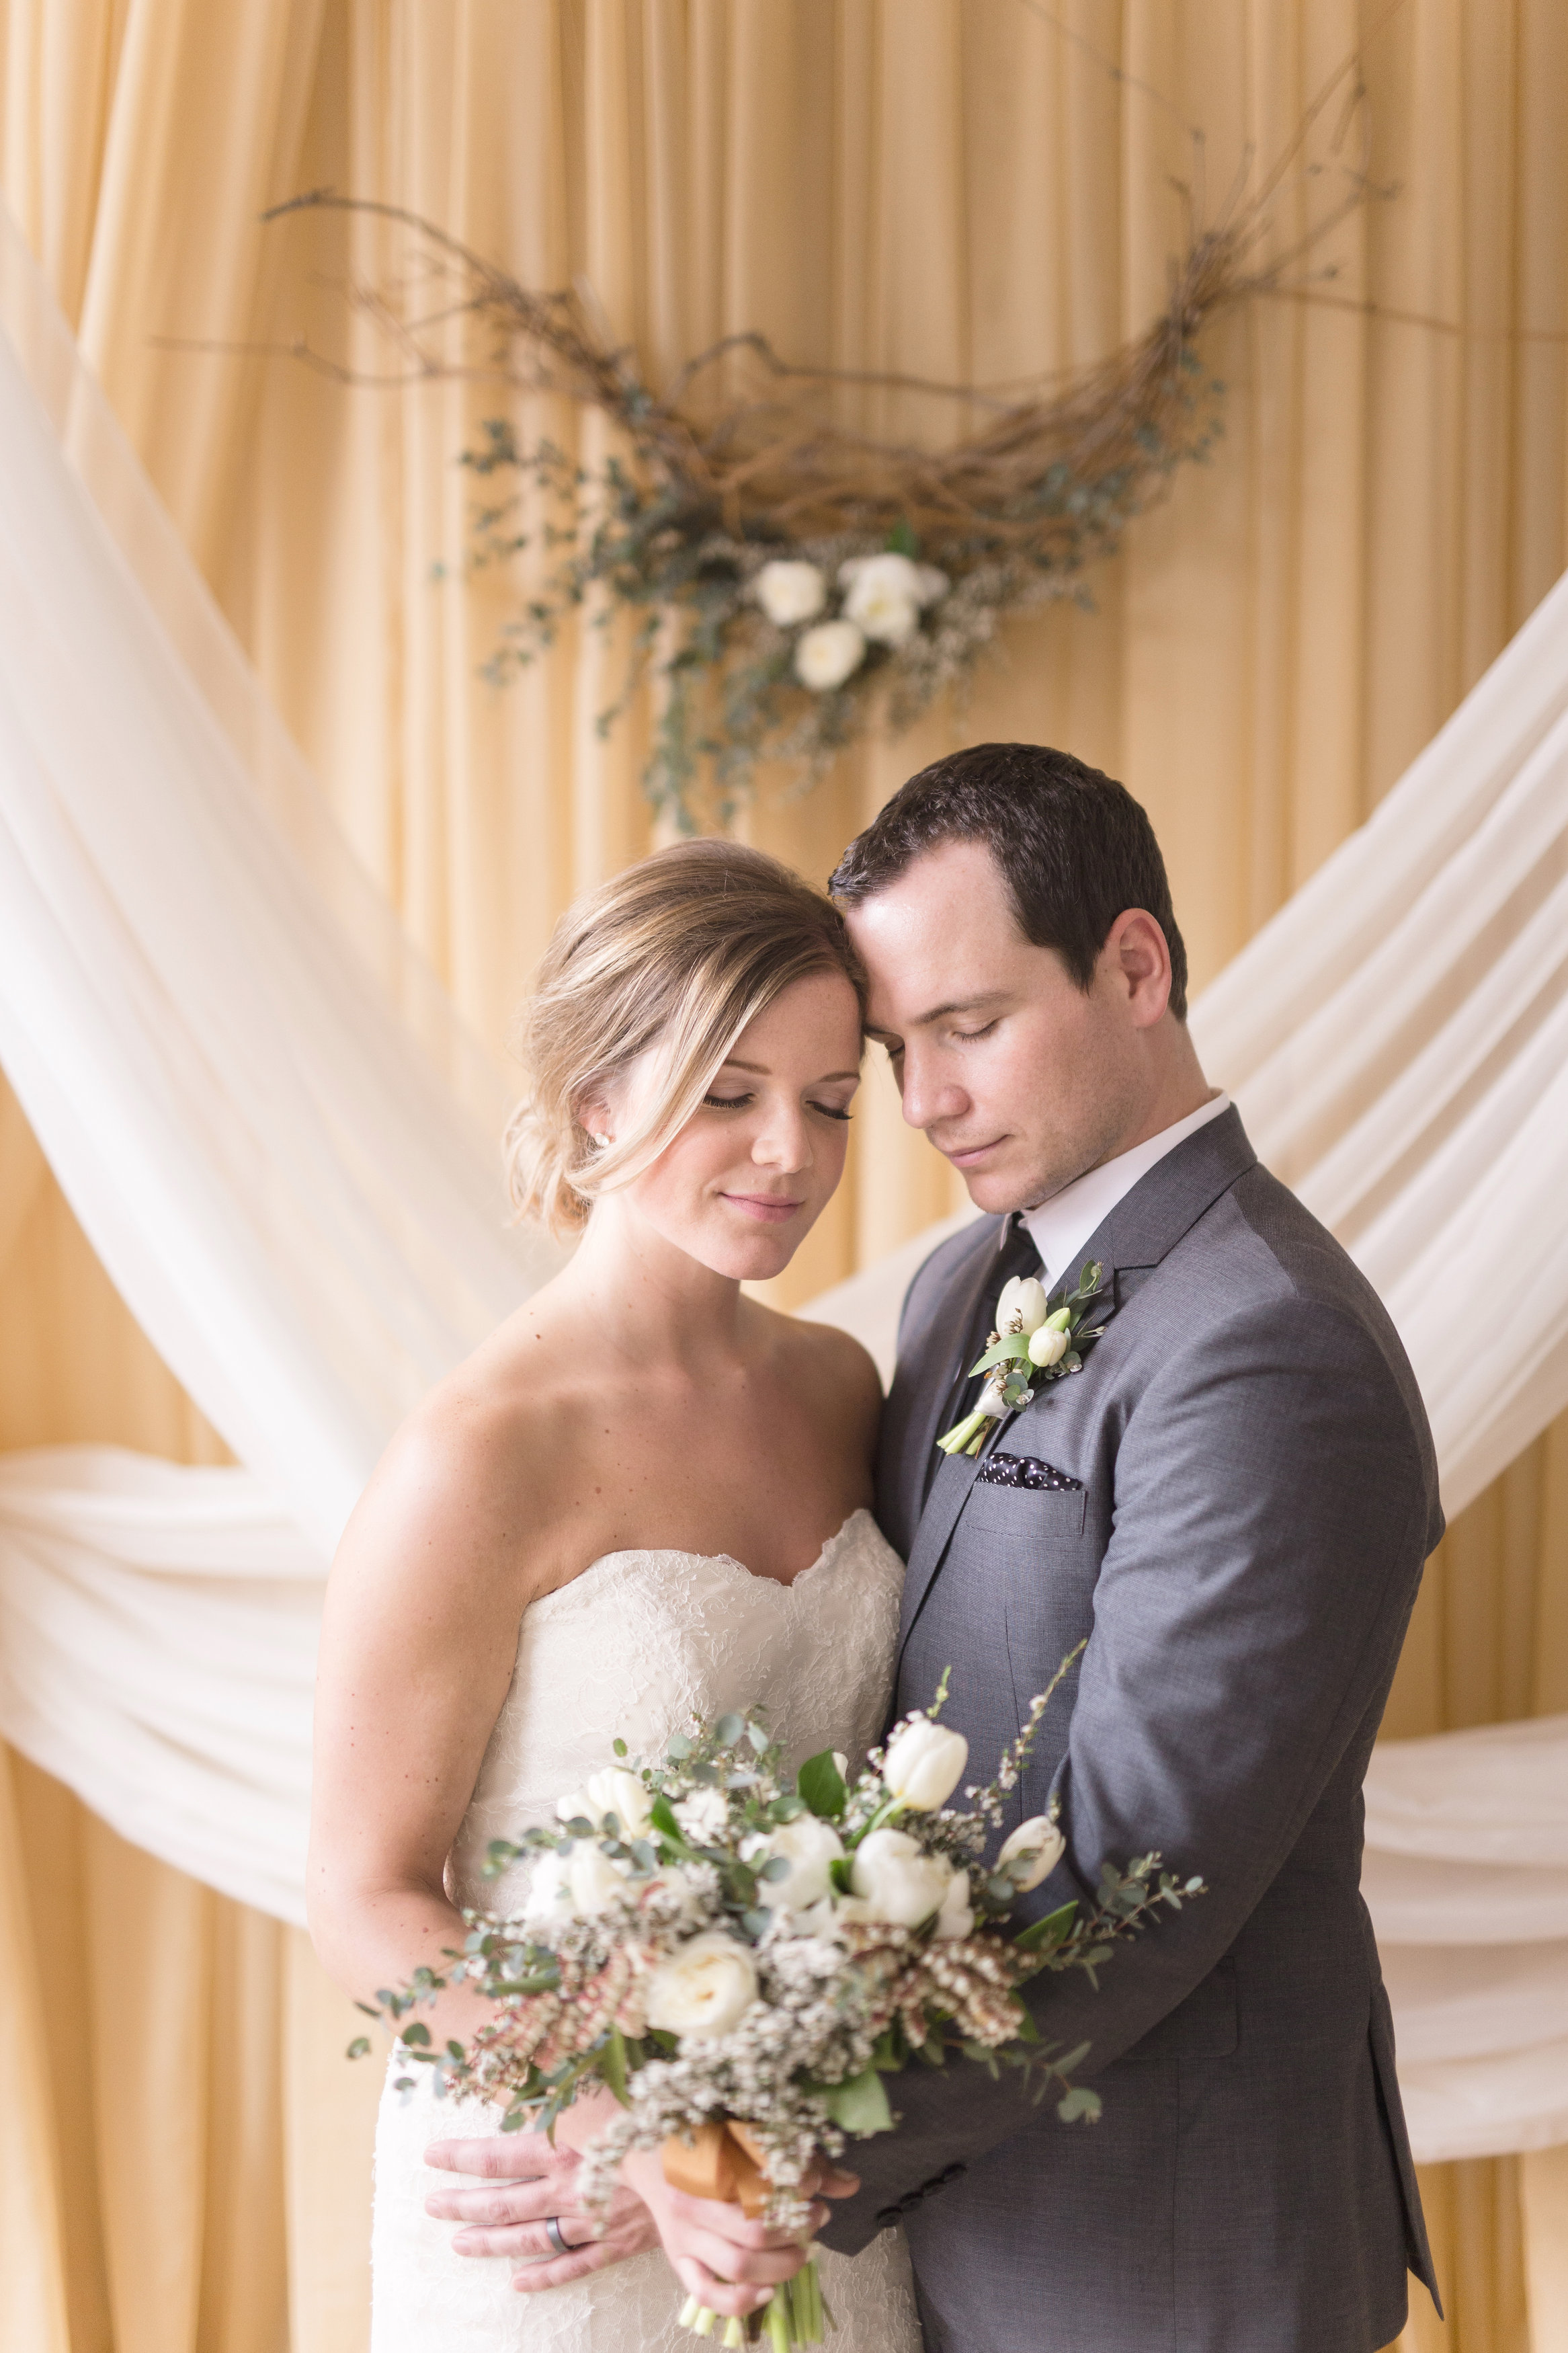 Gold and Ivory Wedding Decor - Wedding Designer in Winnipeg